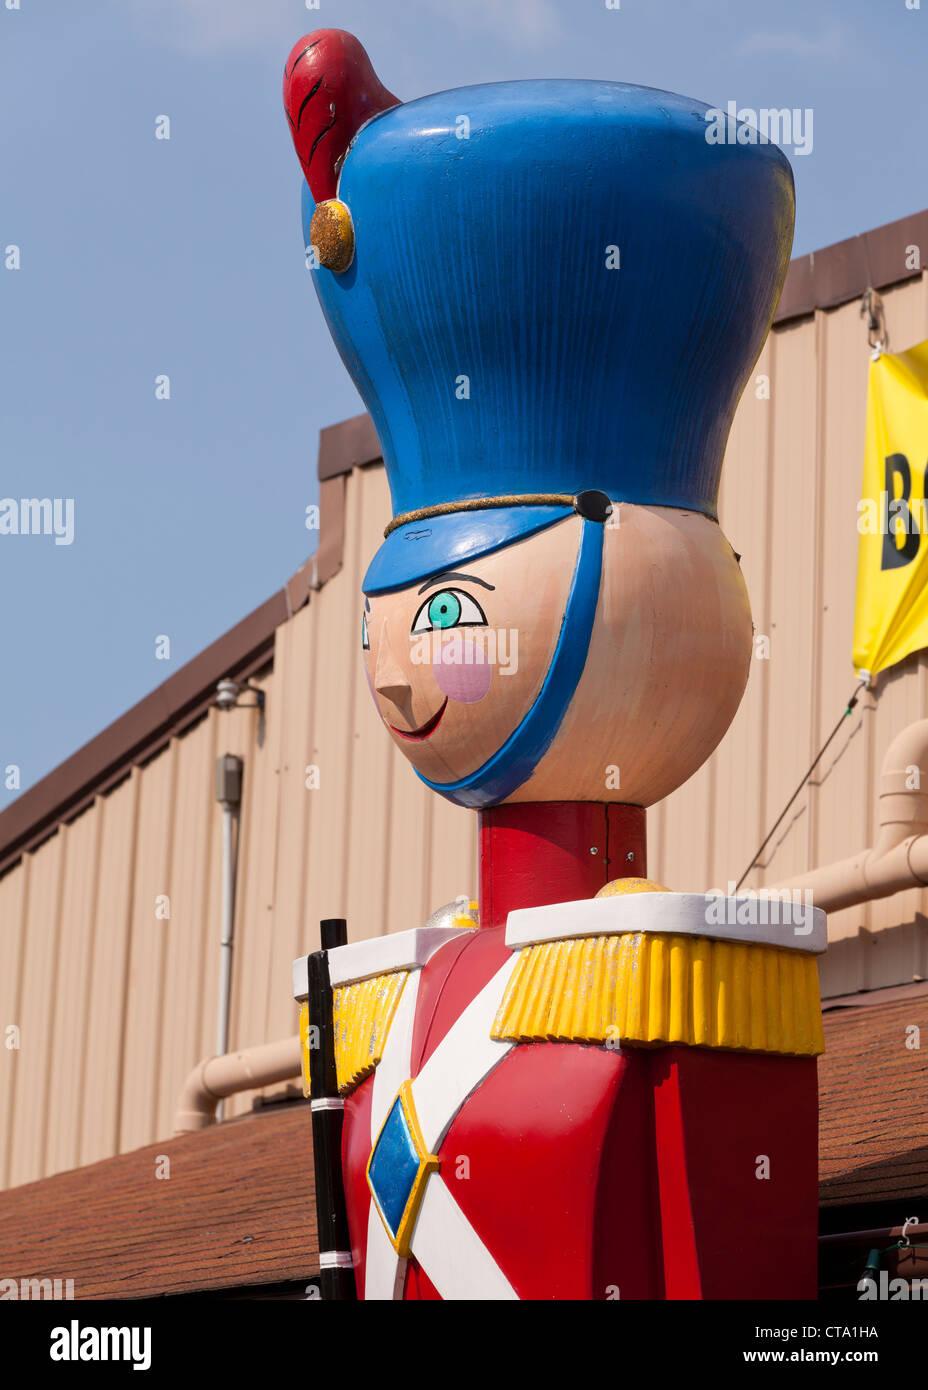 Große Statue von Nussknacker Spielzeugsoldat Stockbild